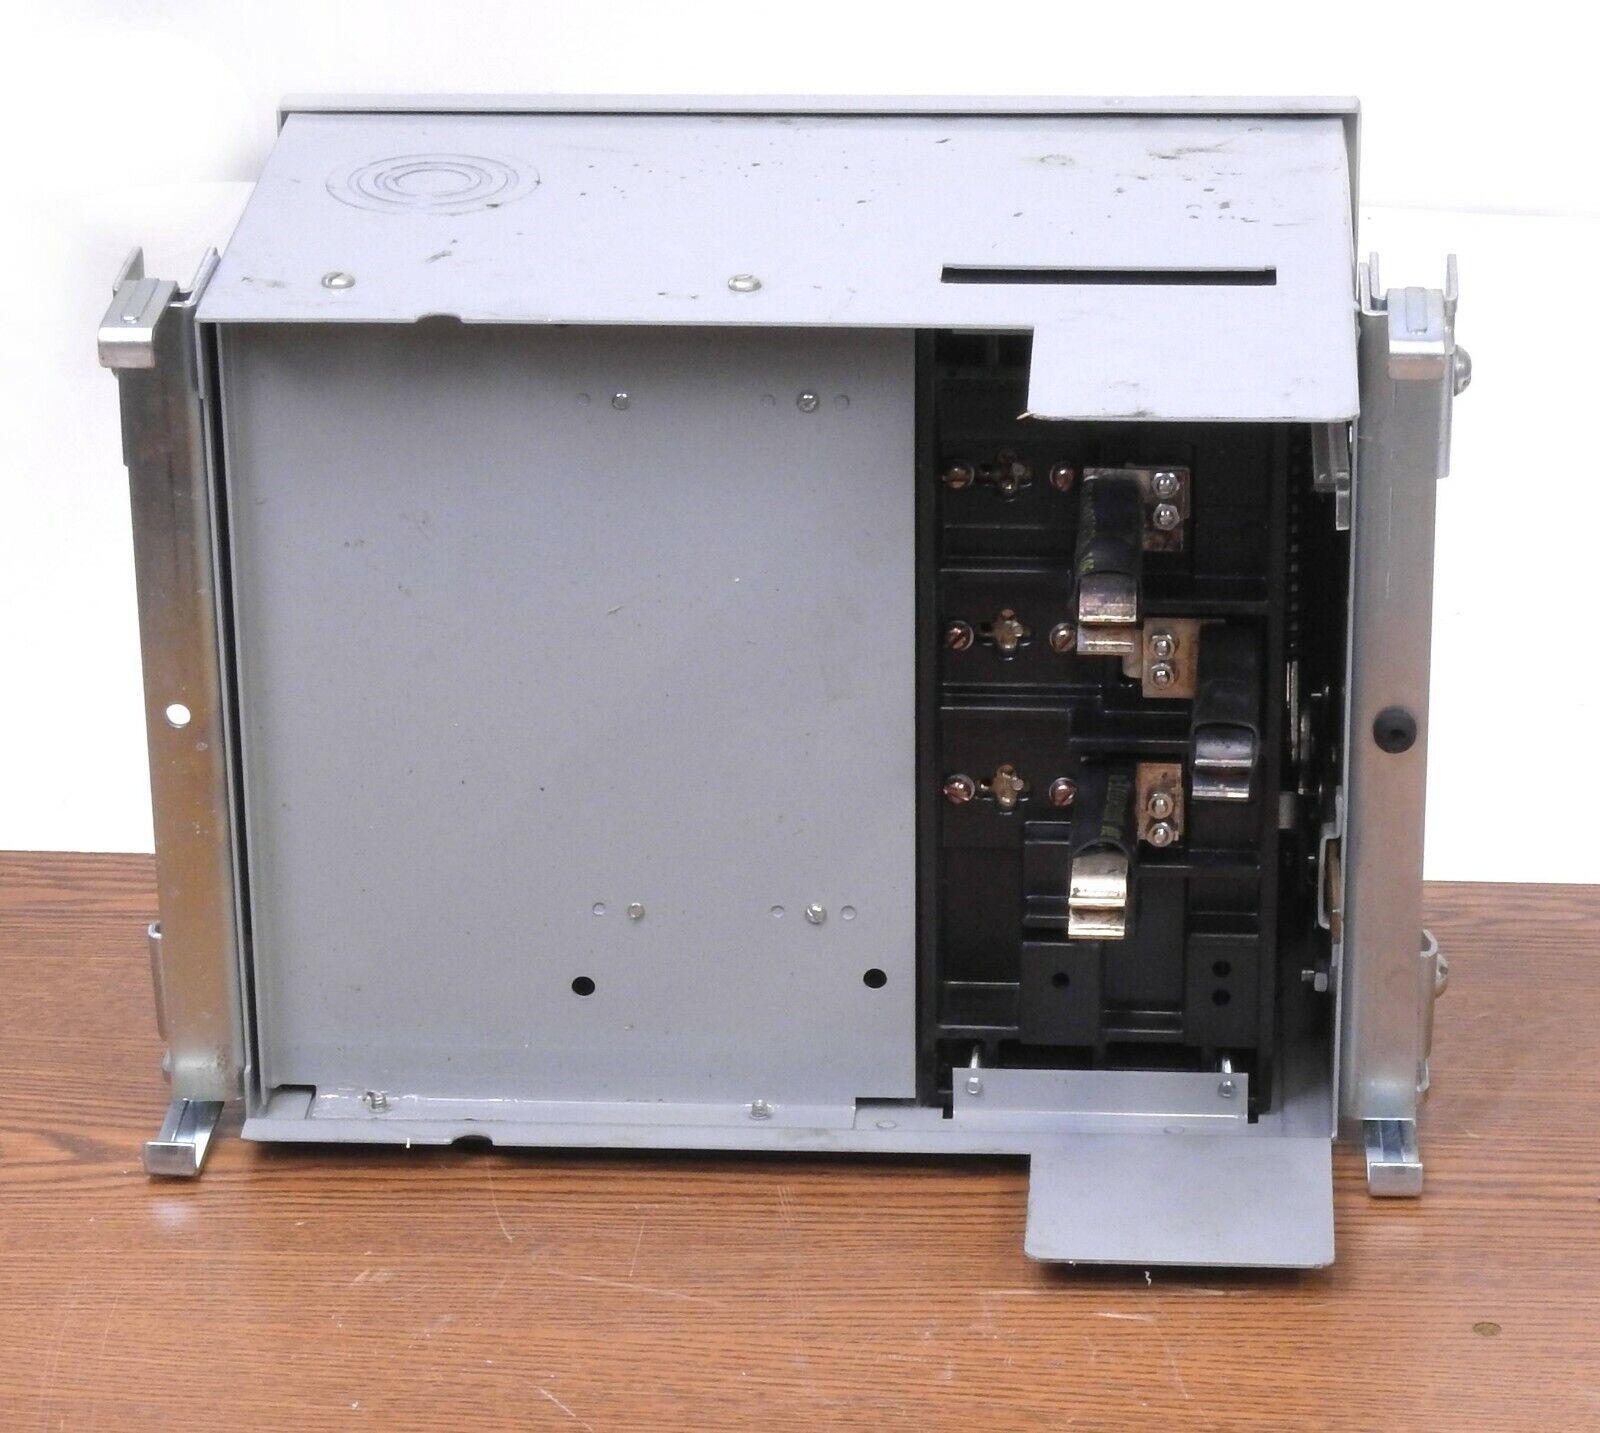 ITE XL-U UV362 60 AMP 600V FUSIBLE SWITCH